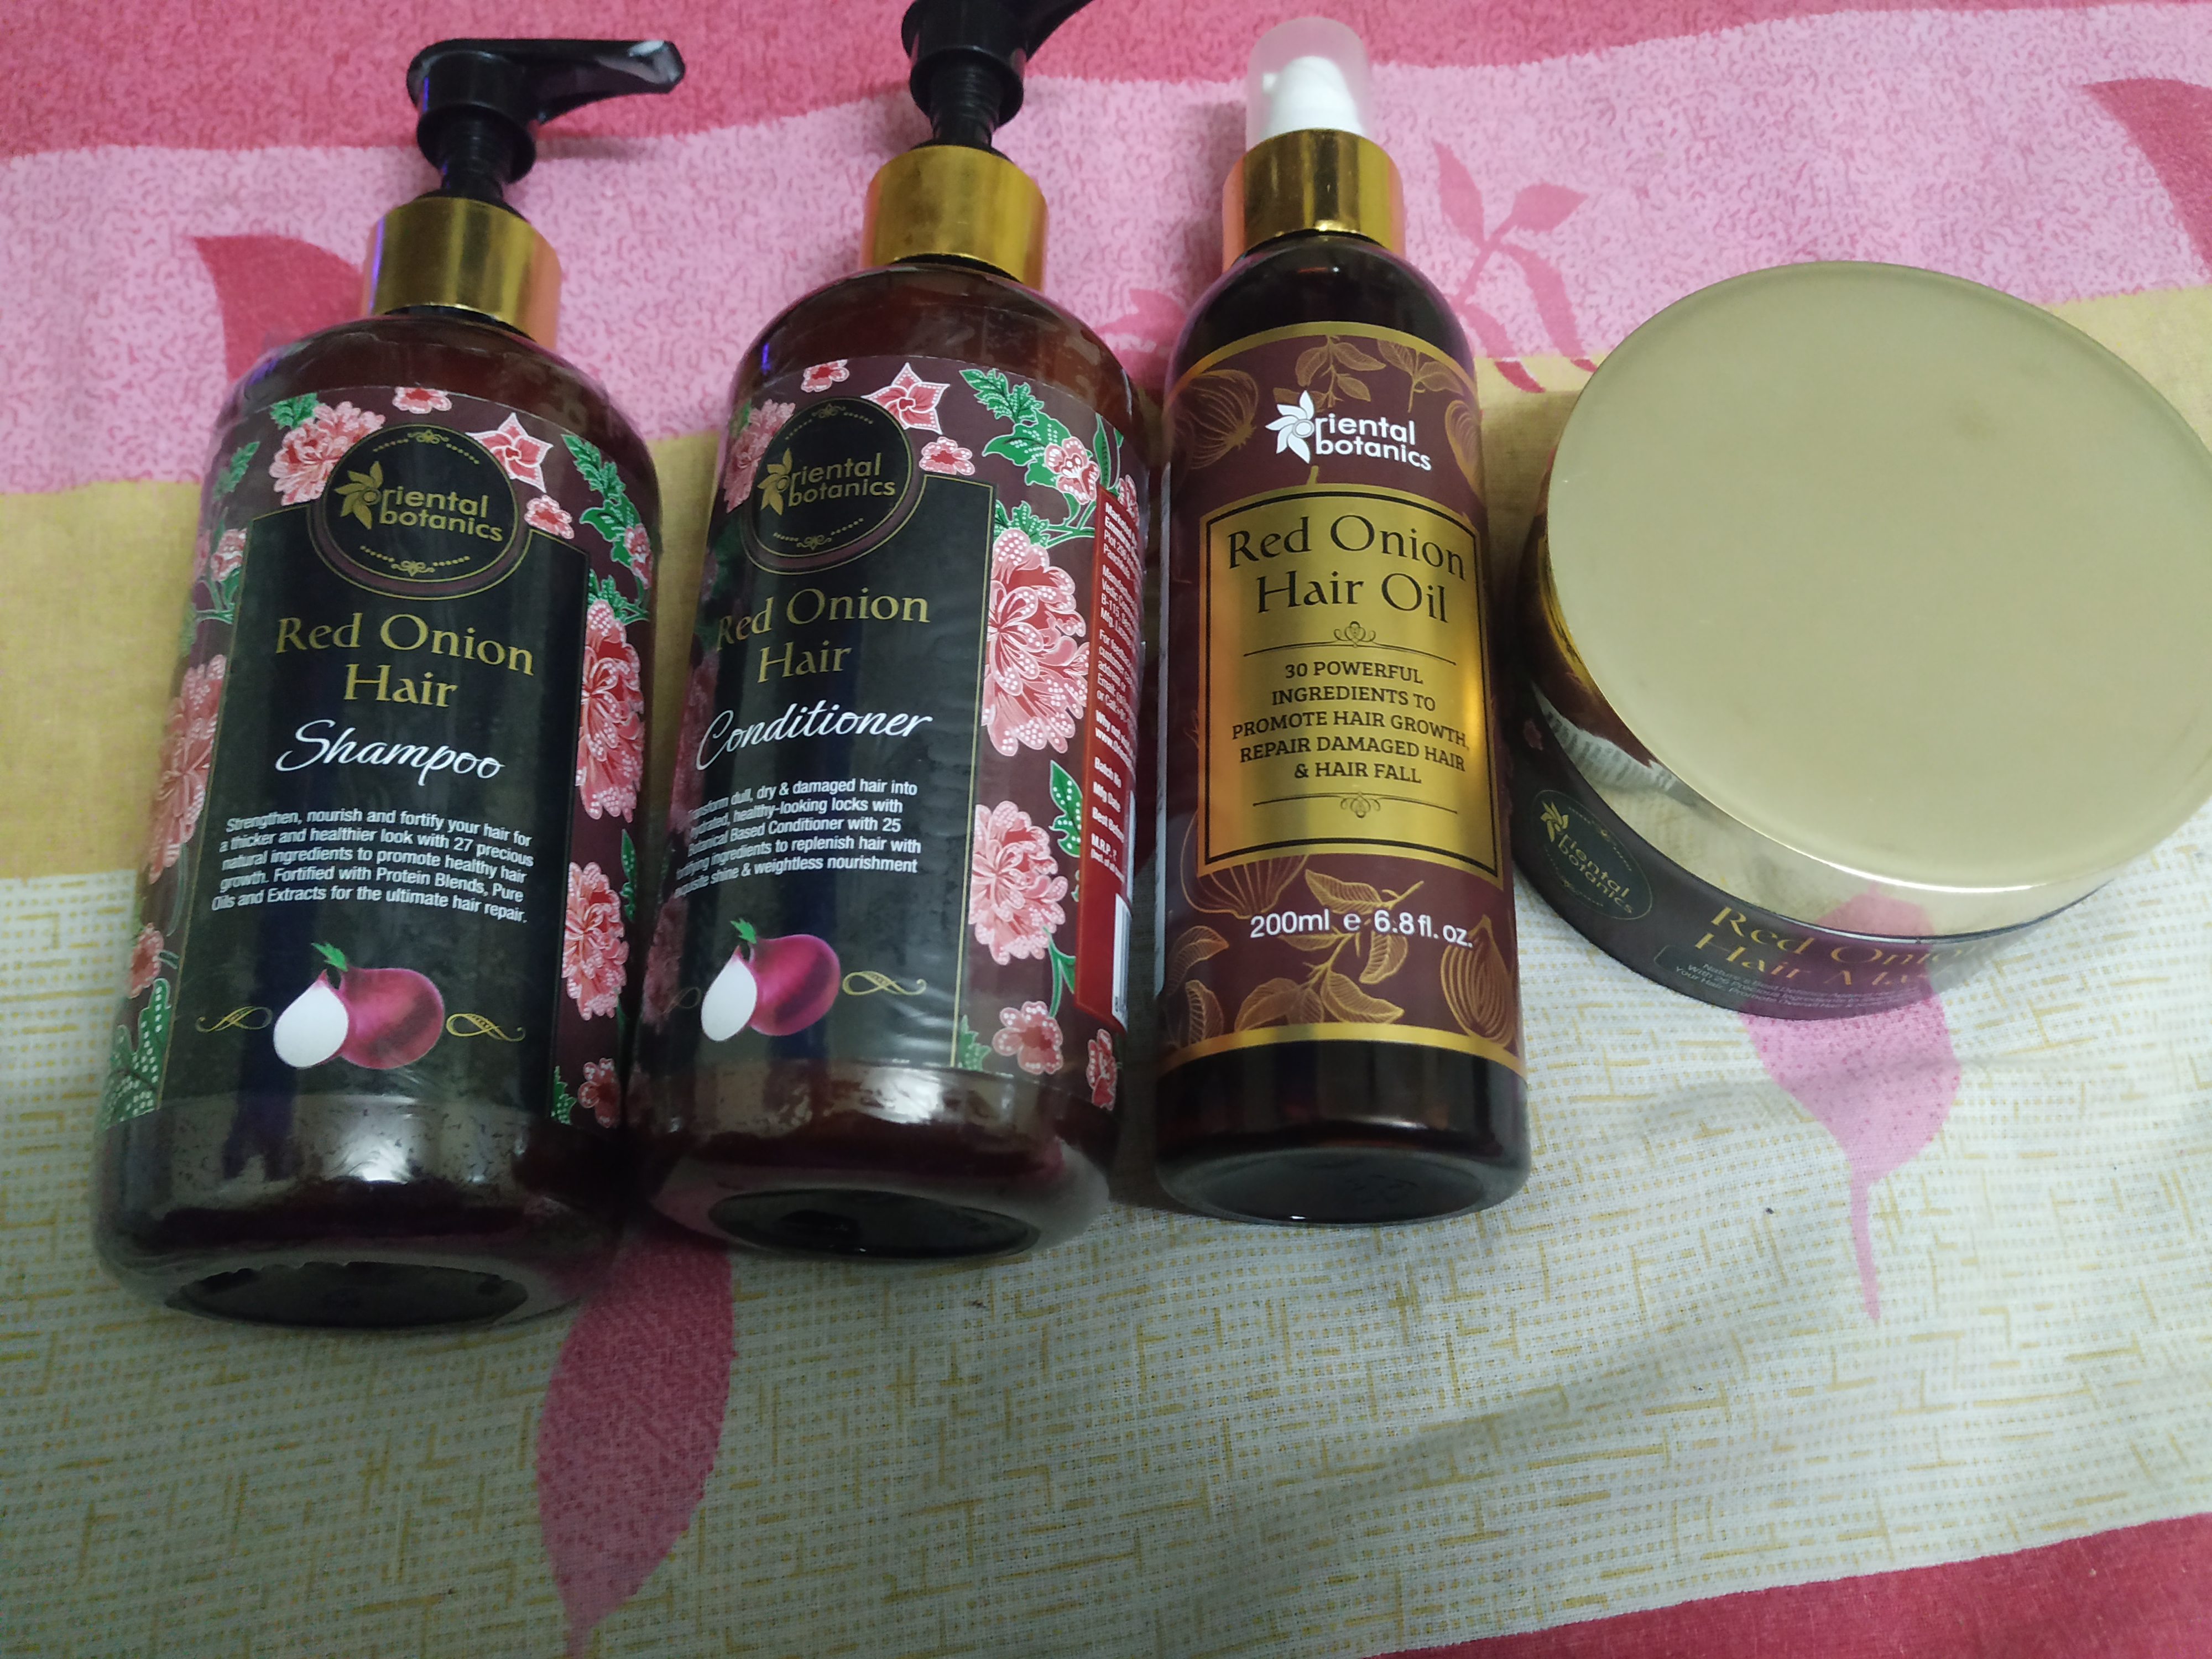 Oriental Botanics Red Onion Hair Shampoo + Conditioner + Oil-Best red onion hair care kit so far-By rita_punjabi